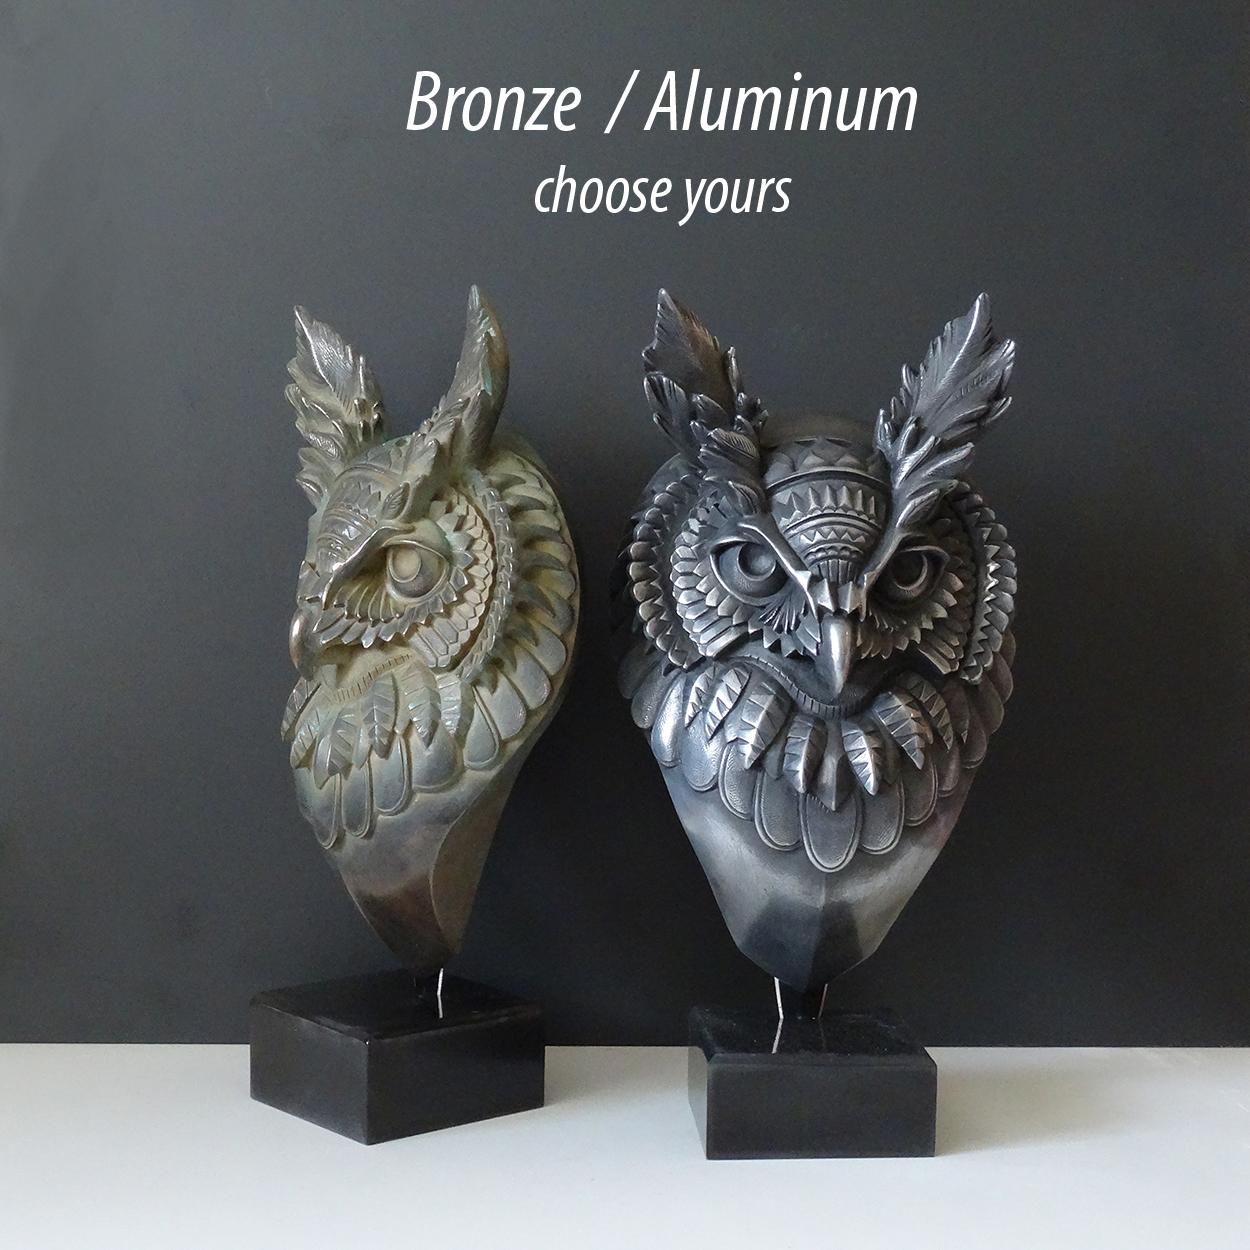 bronze ou Aluminium